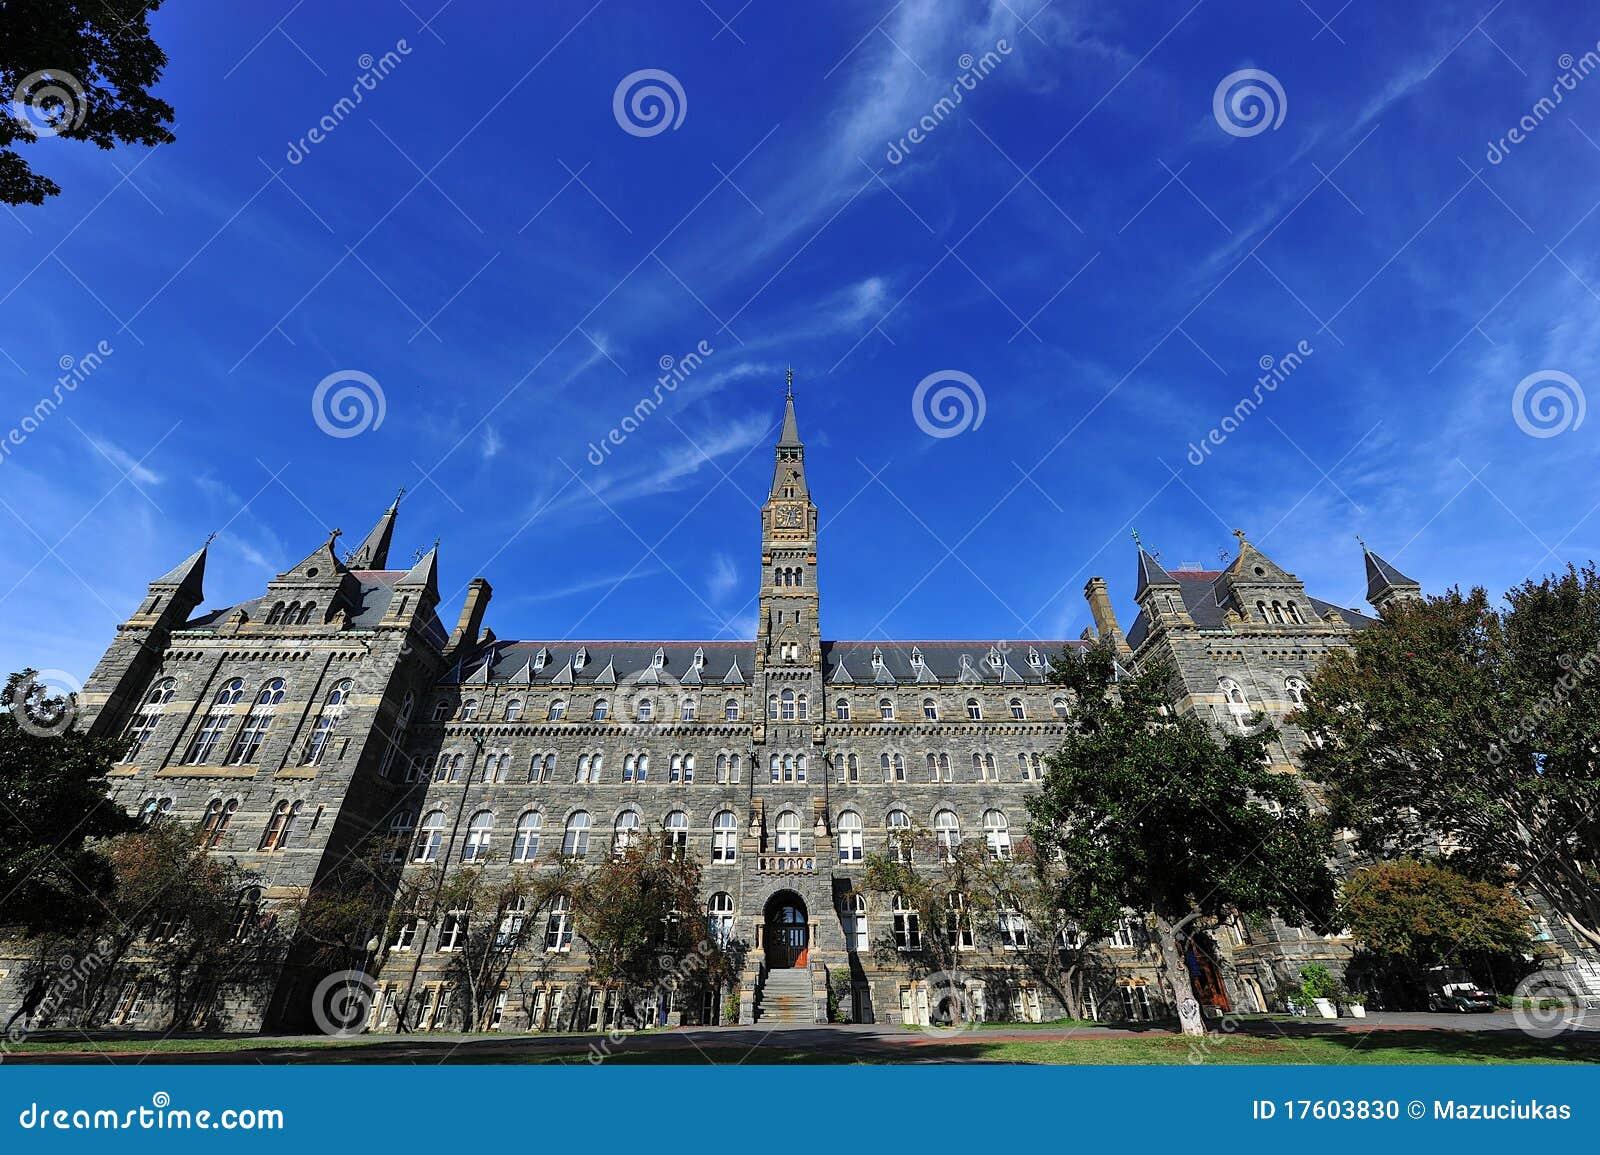 Georgetown University Stock Photo - Image: 17603830